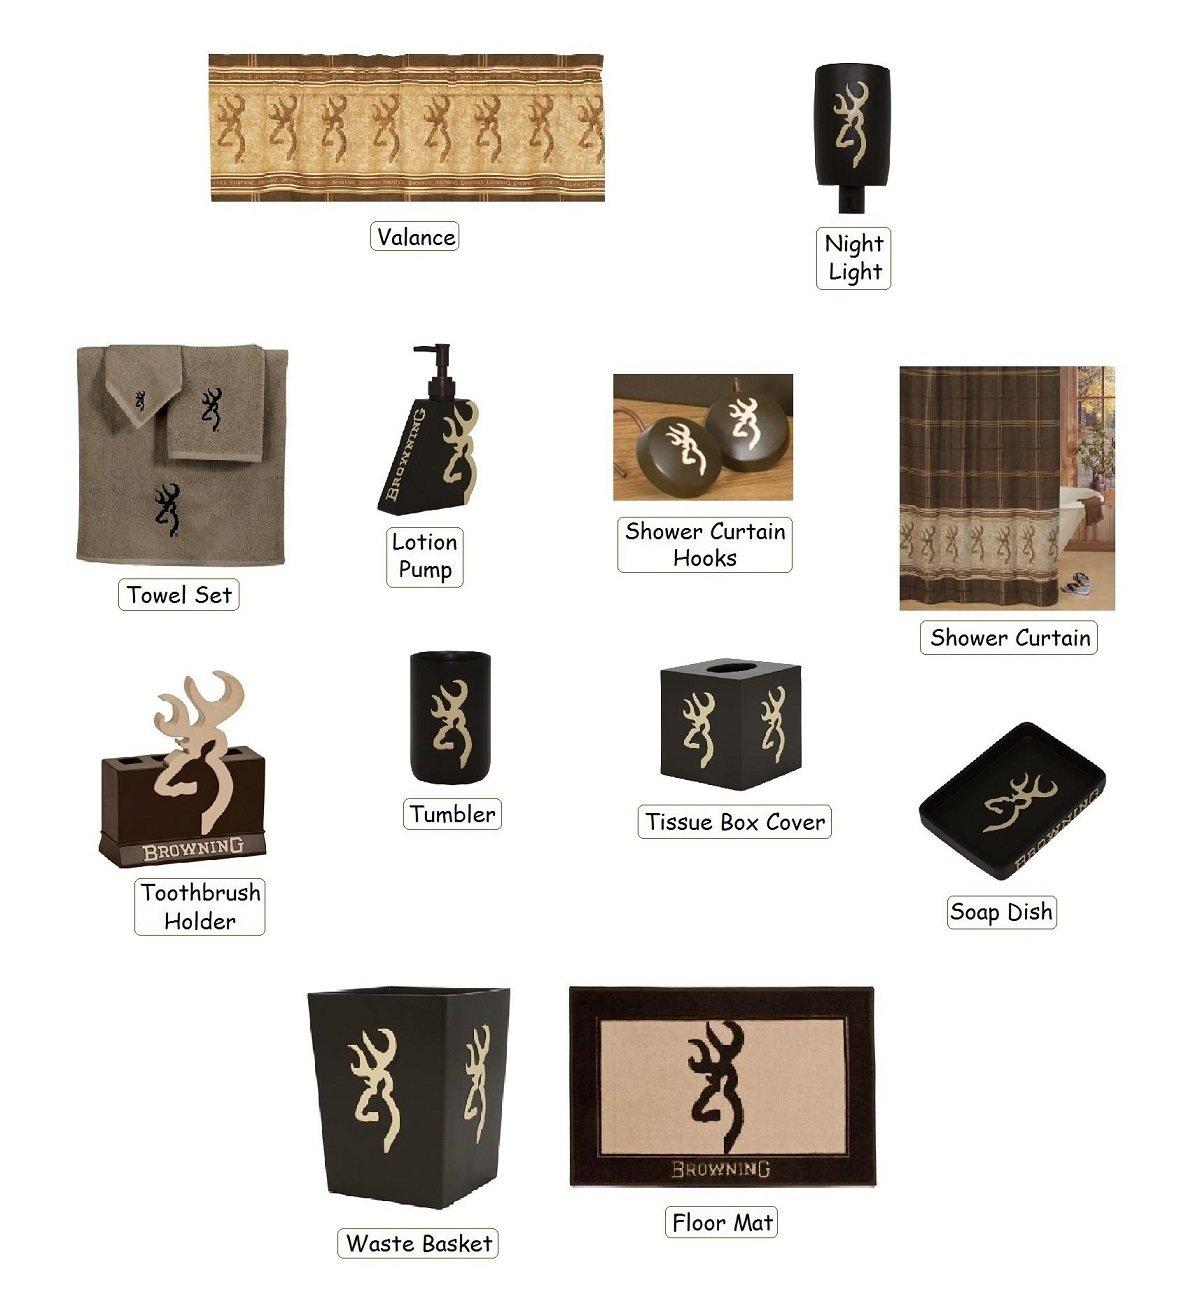 Camo bathroom decor - Amazon Com Browning Buckmark 25 Piece Bathroom Decor Accessories Set Tan And Brown Home Kitchen